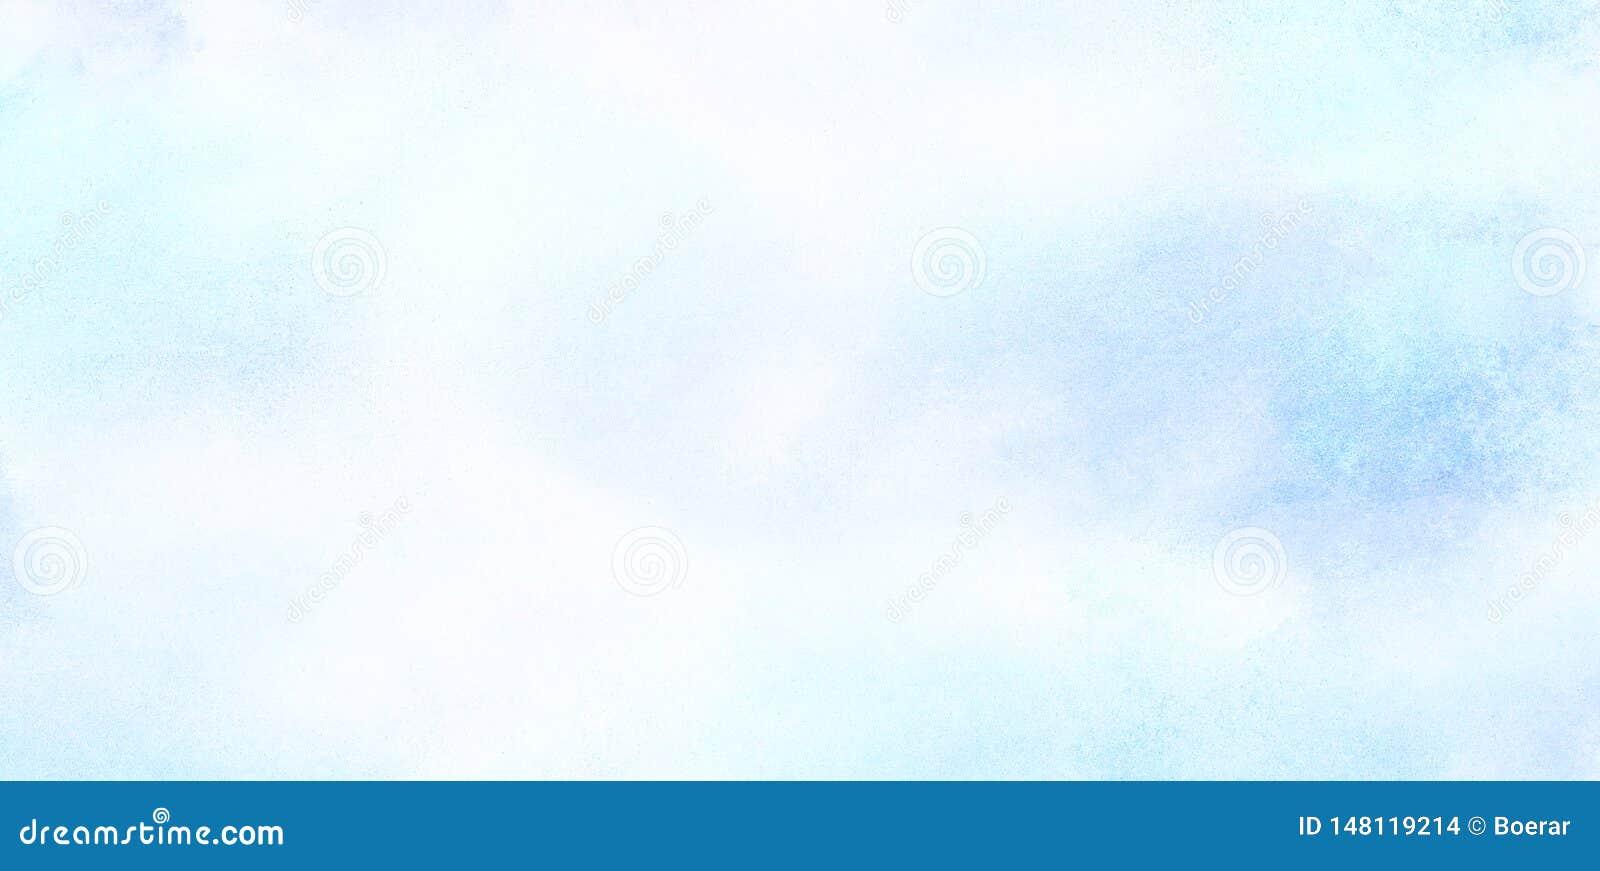 Sky blue color light watercolor background. Aquarelle painted paper textured canvas for vintage design, invitation ca